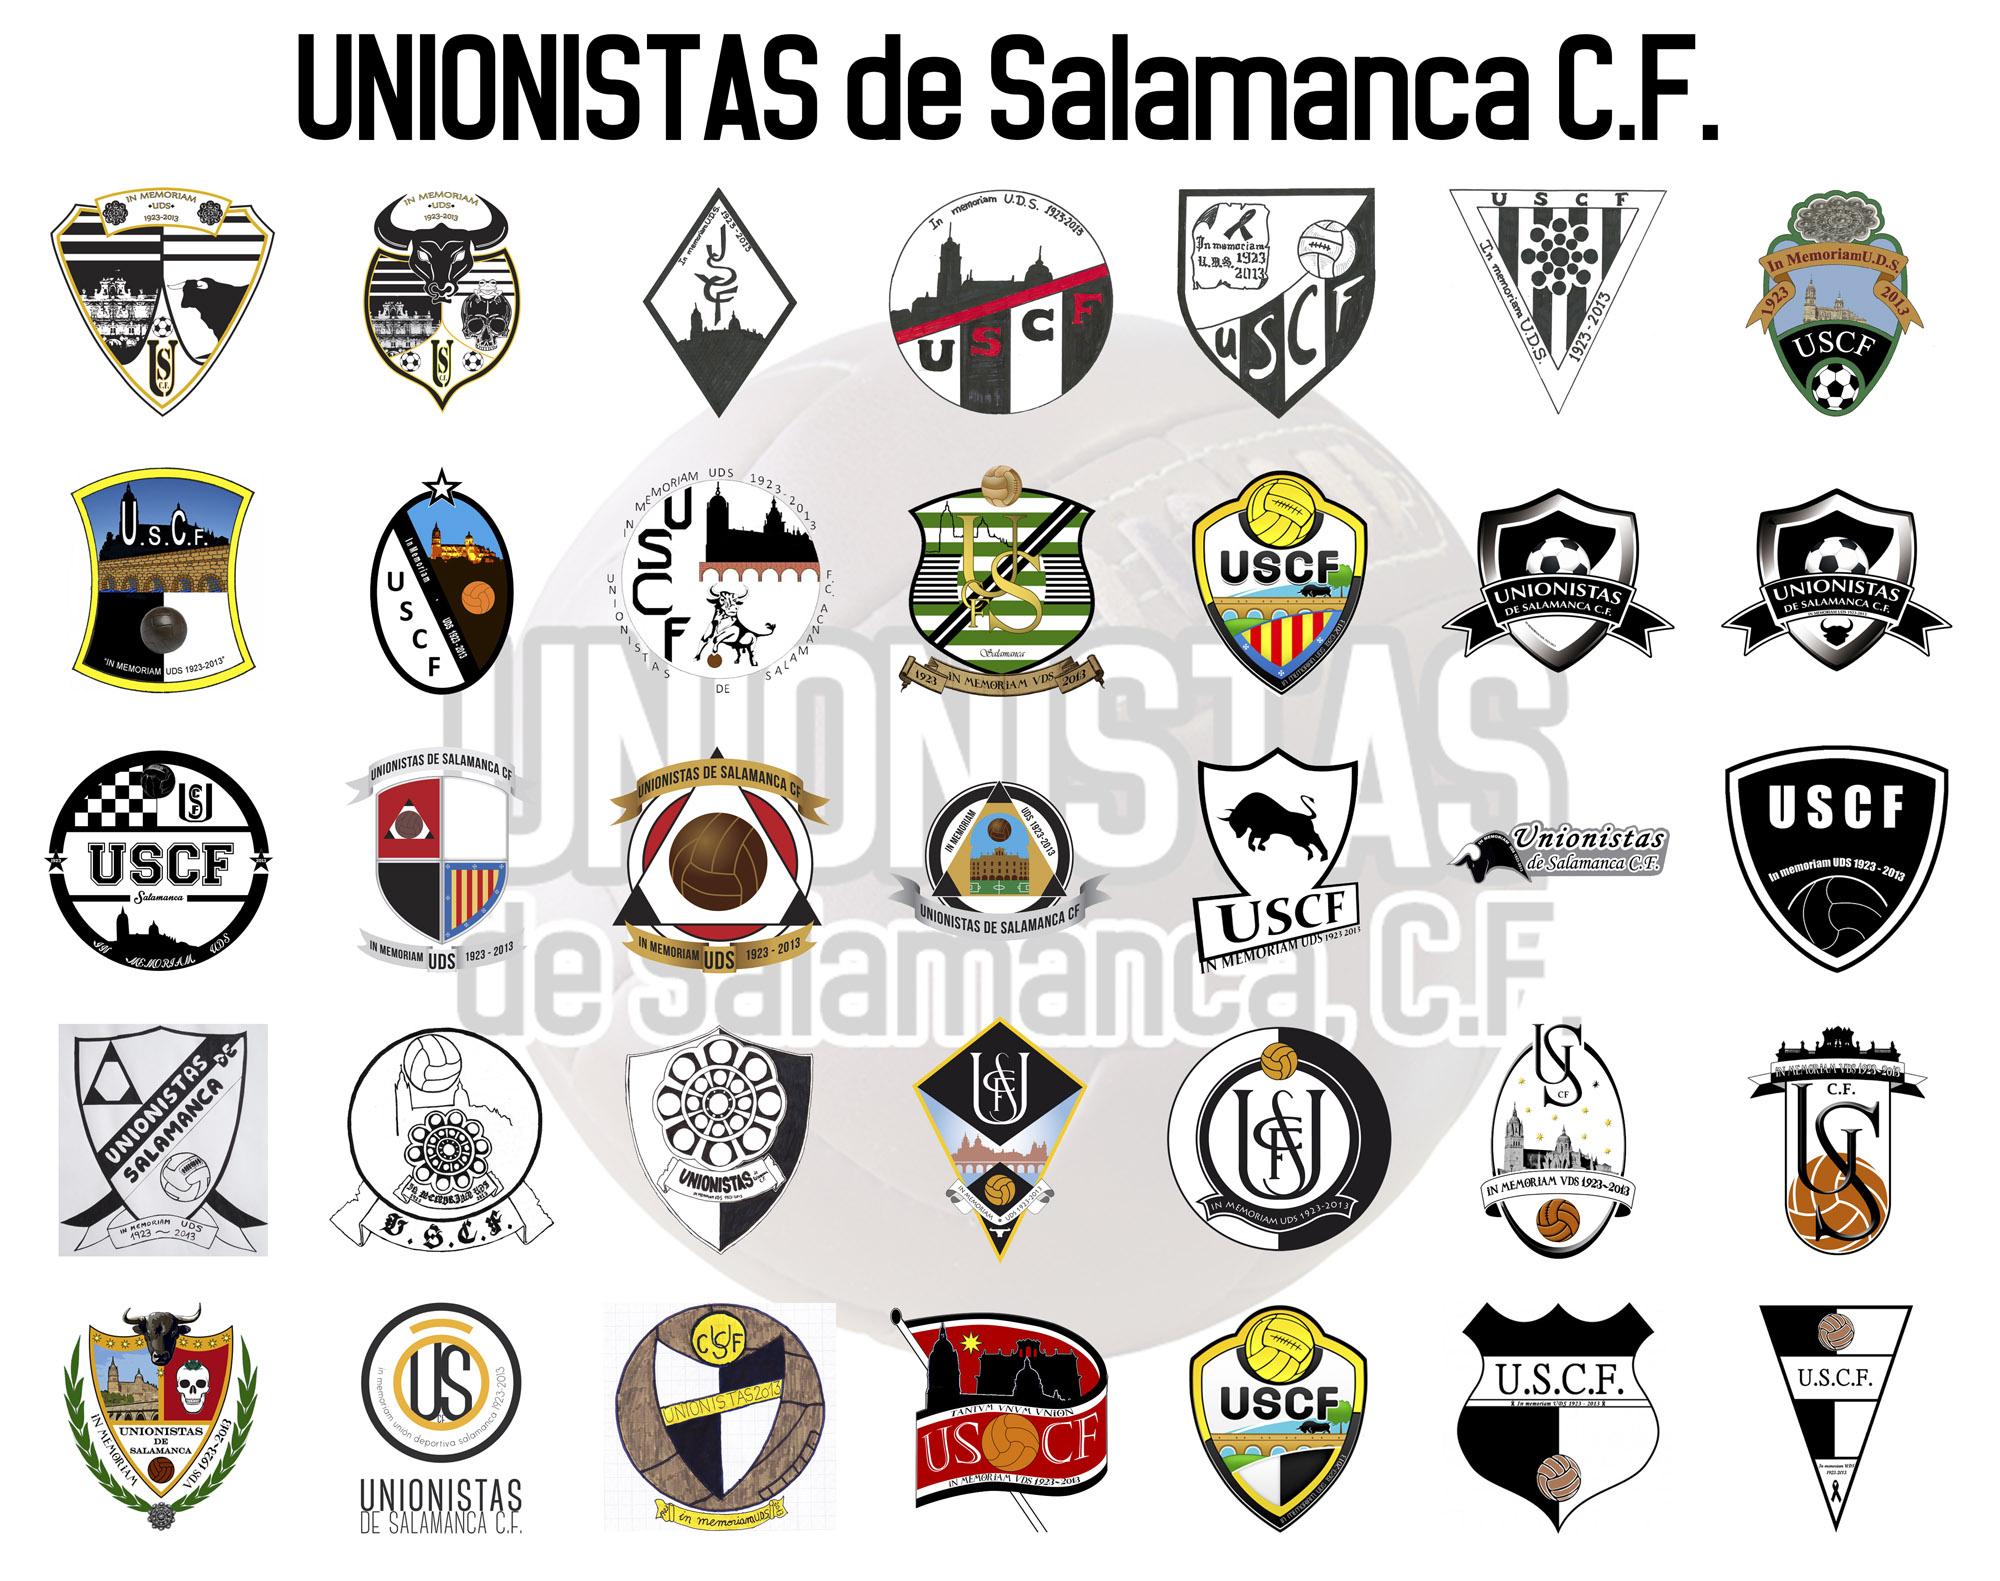 Concurso dise o escudo unionistas de salamanca c f - Nombres clasicos espanoles ...